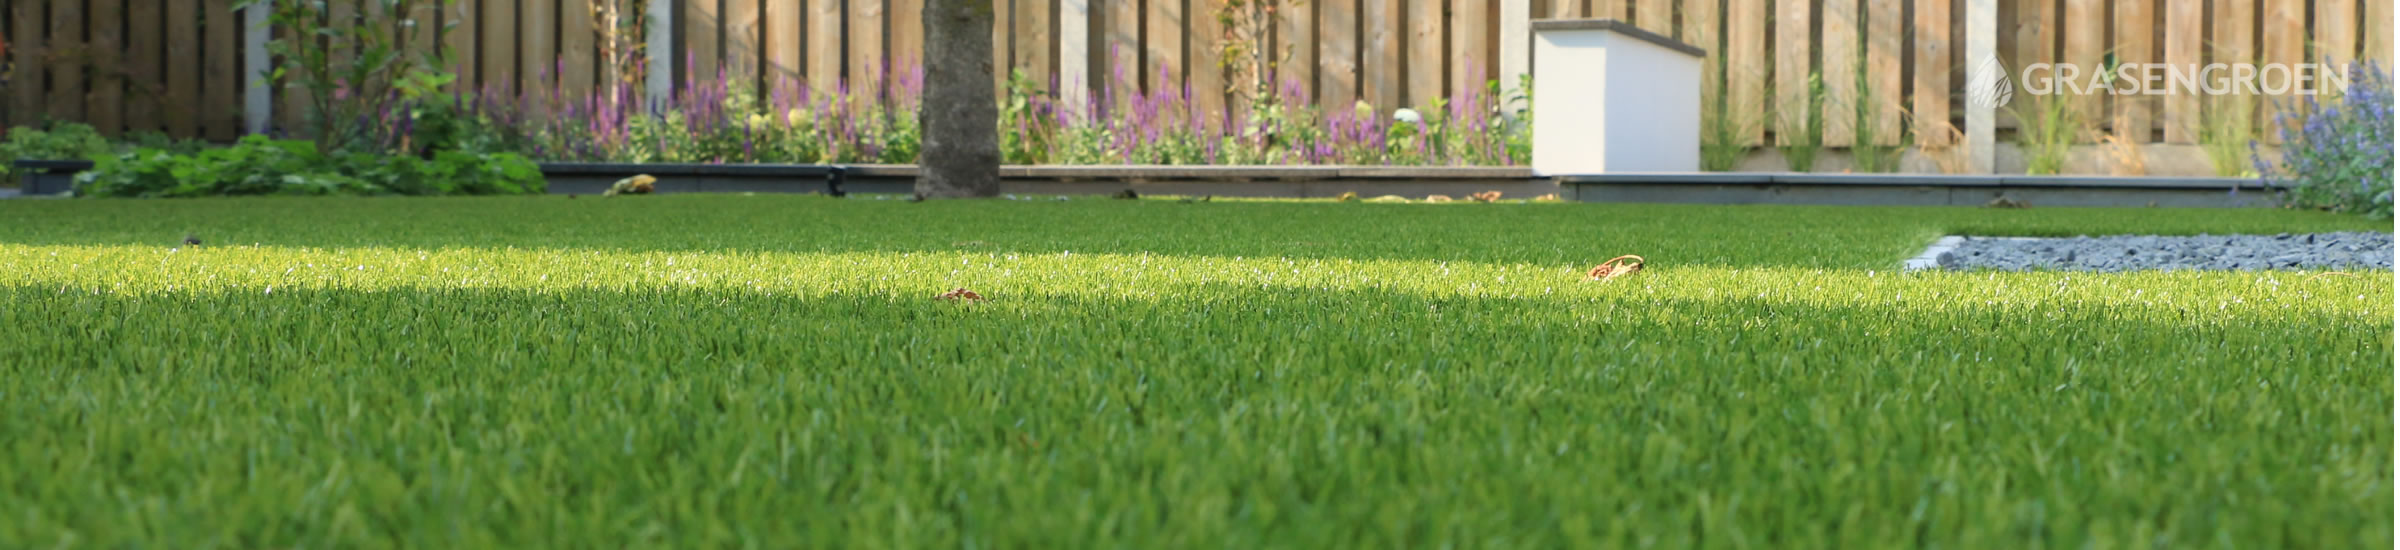 legservice kunstgras • Gras en Groen Kunstgras